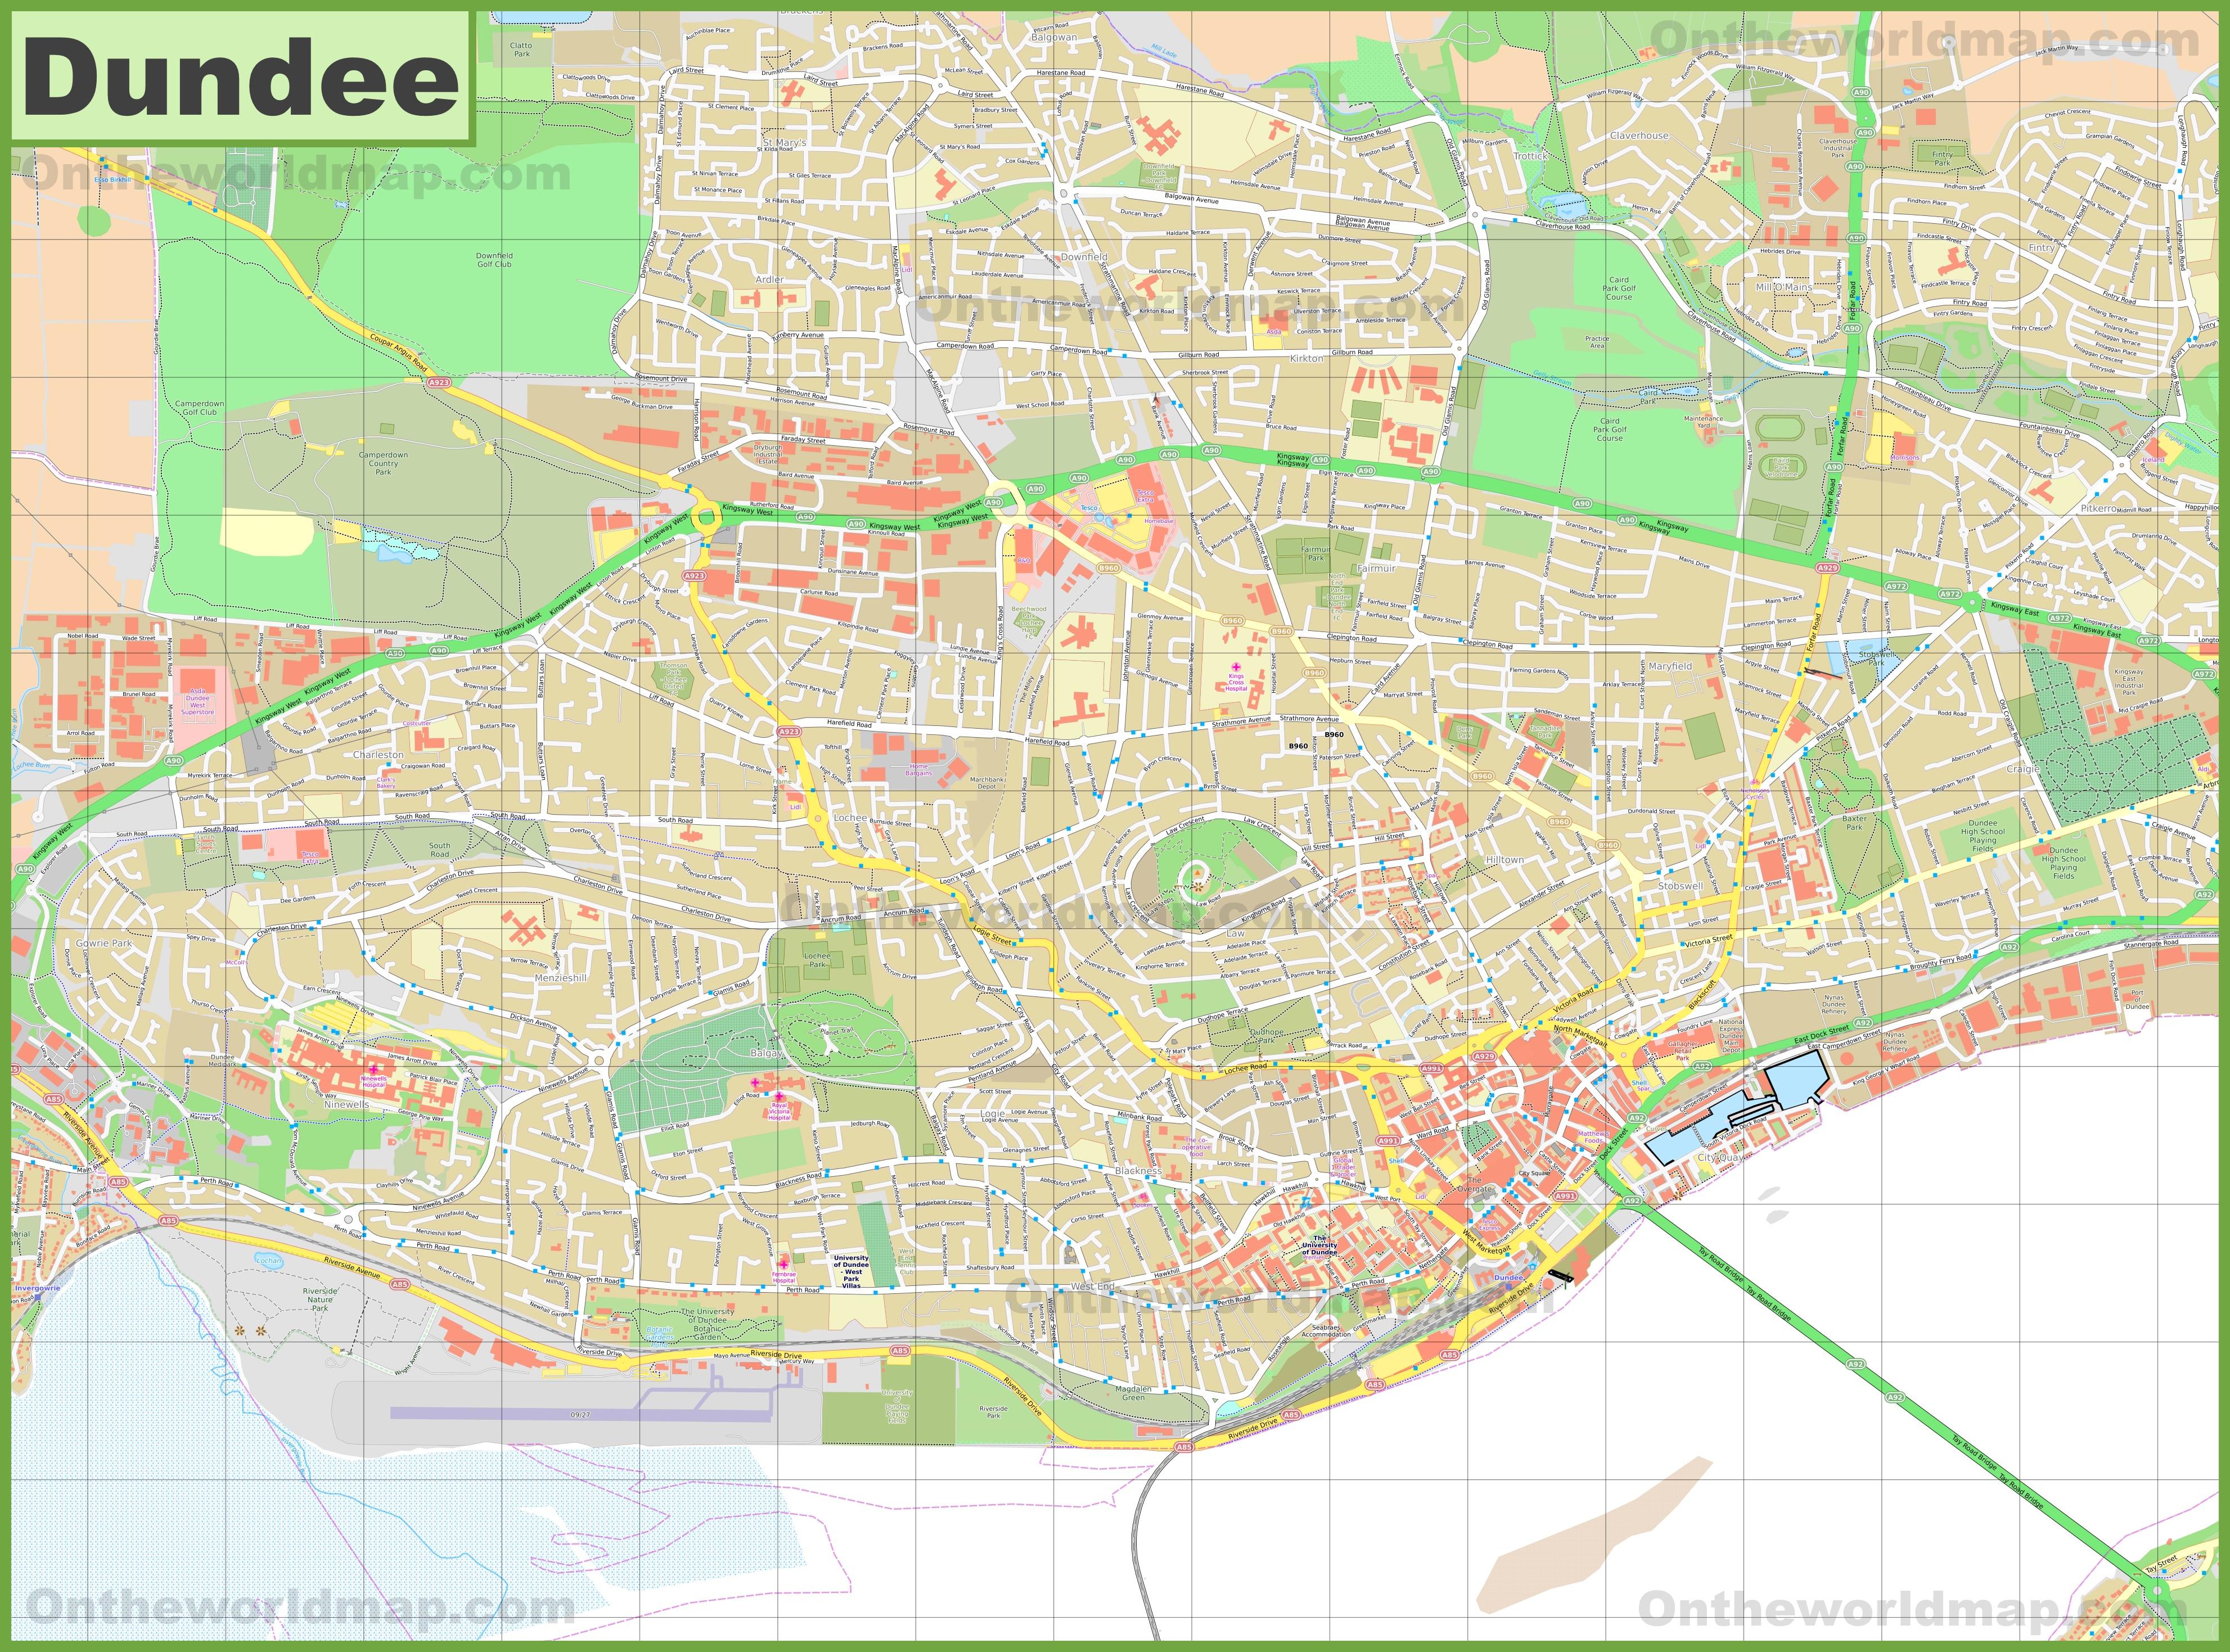 Detailed Map Of Dundee - Dundee Florida Map